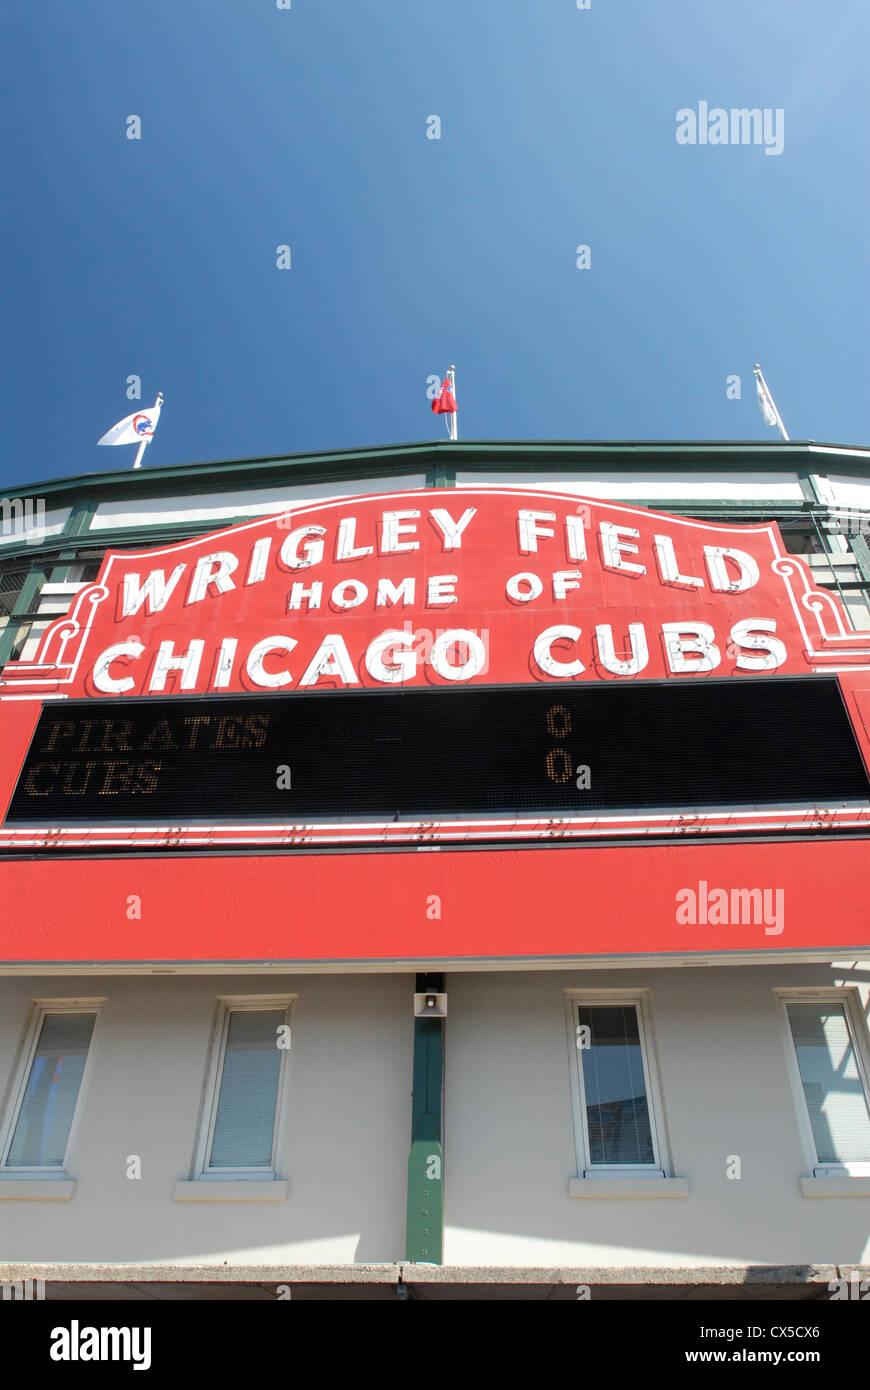 Chicago Cubs team,  Wrigley Field baseball stadium sign, Chicago, Illinois - Stock Image